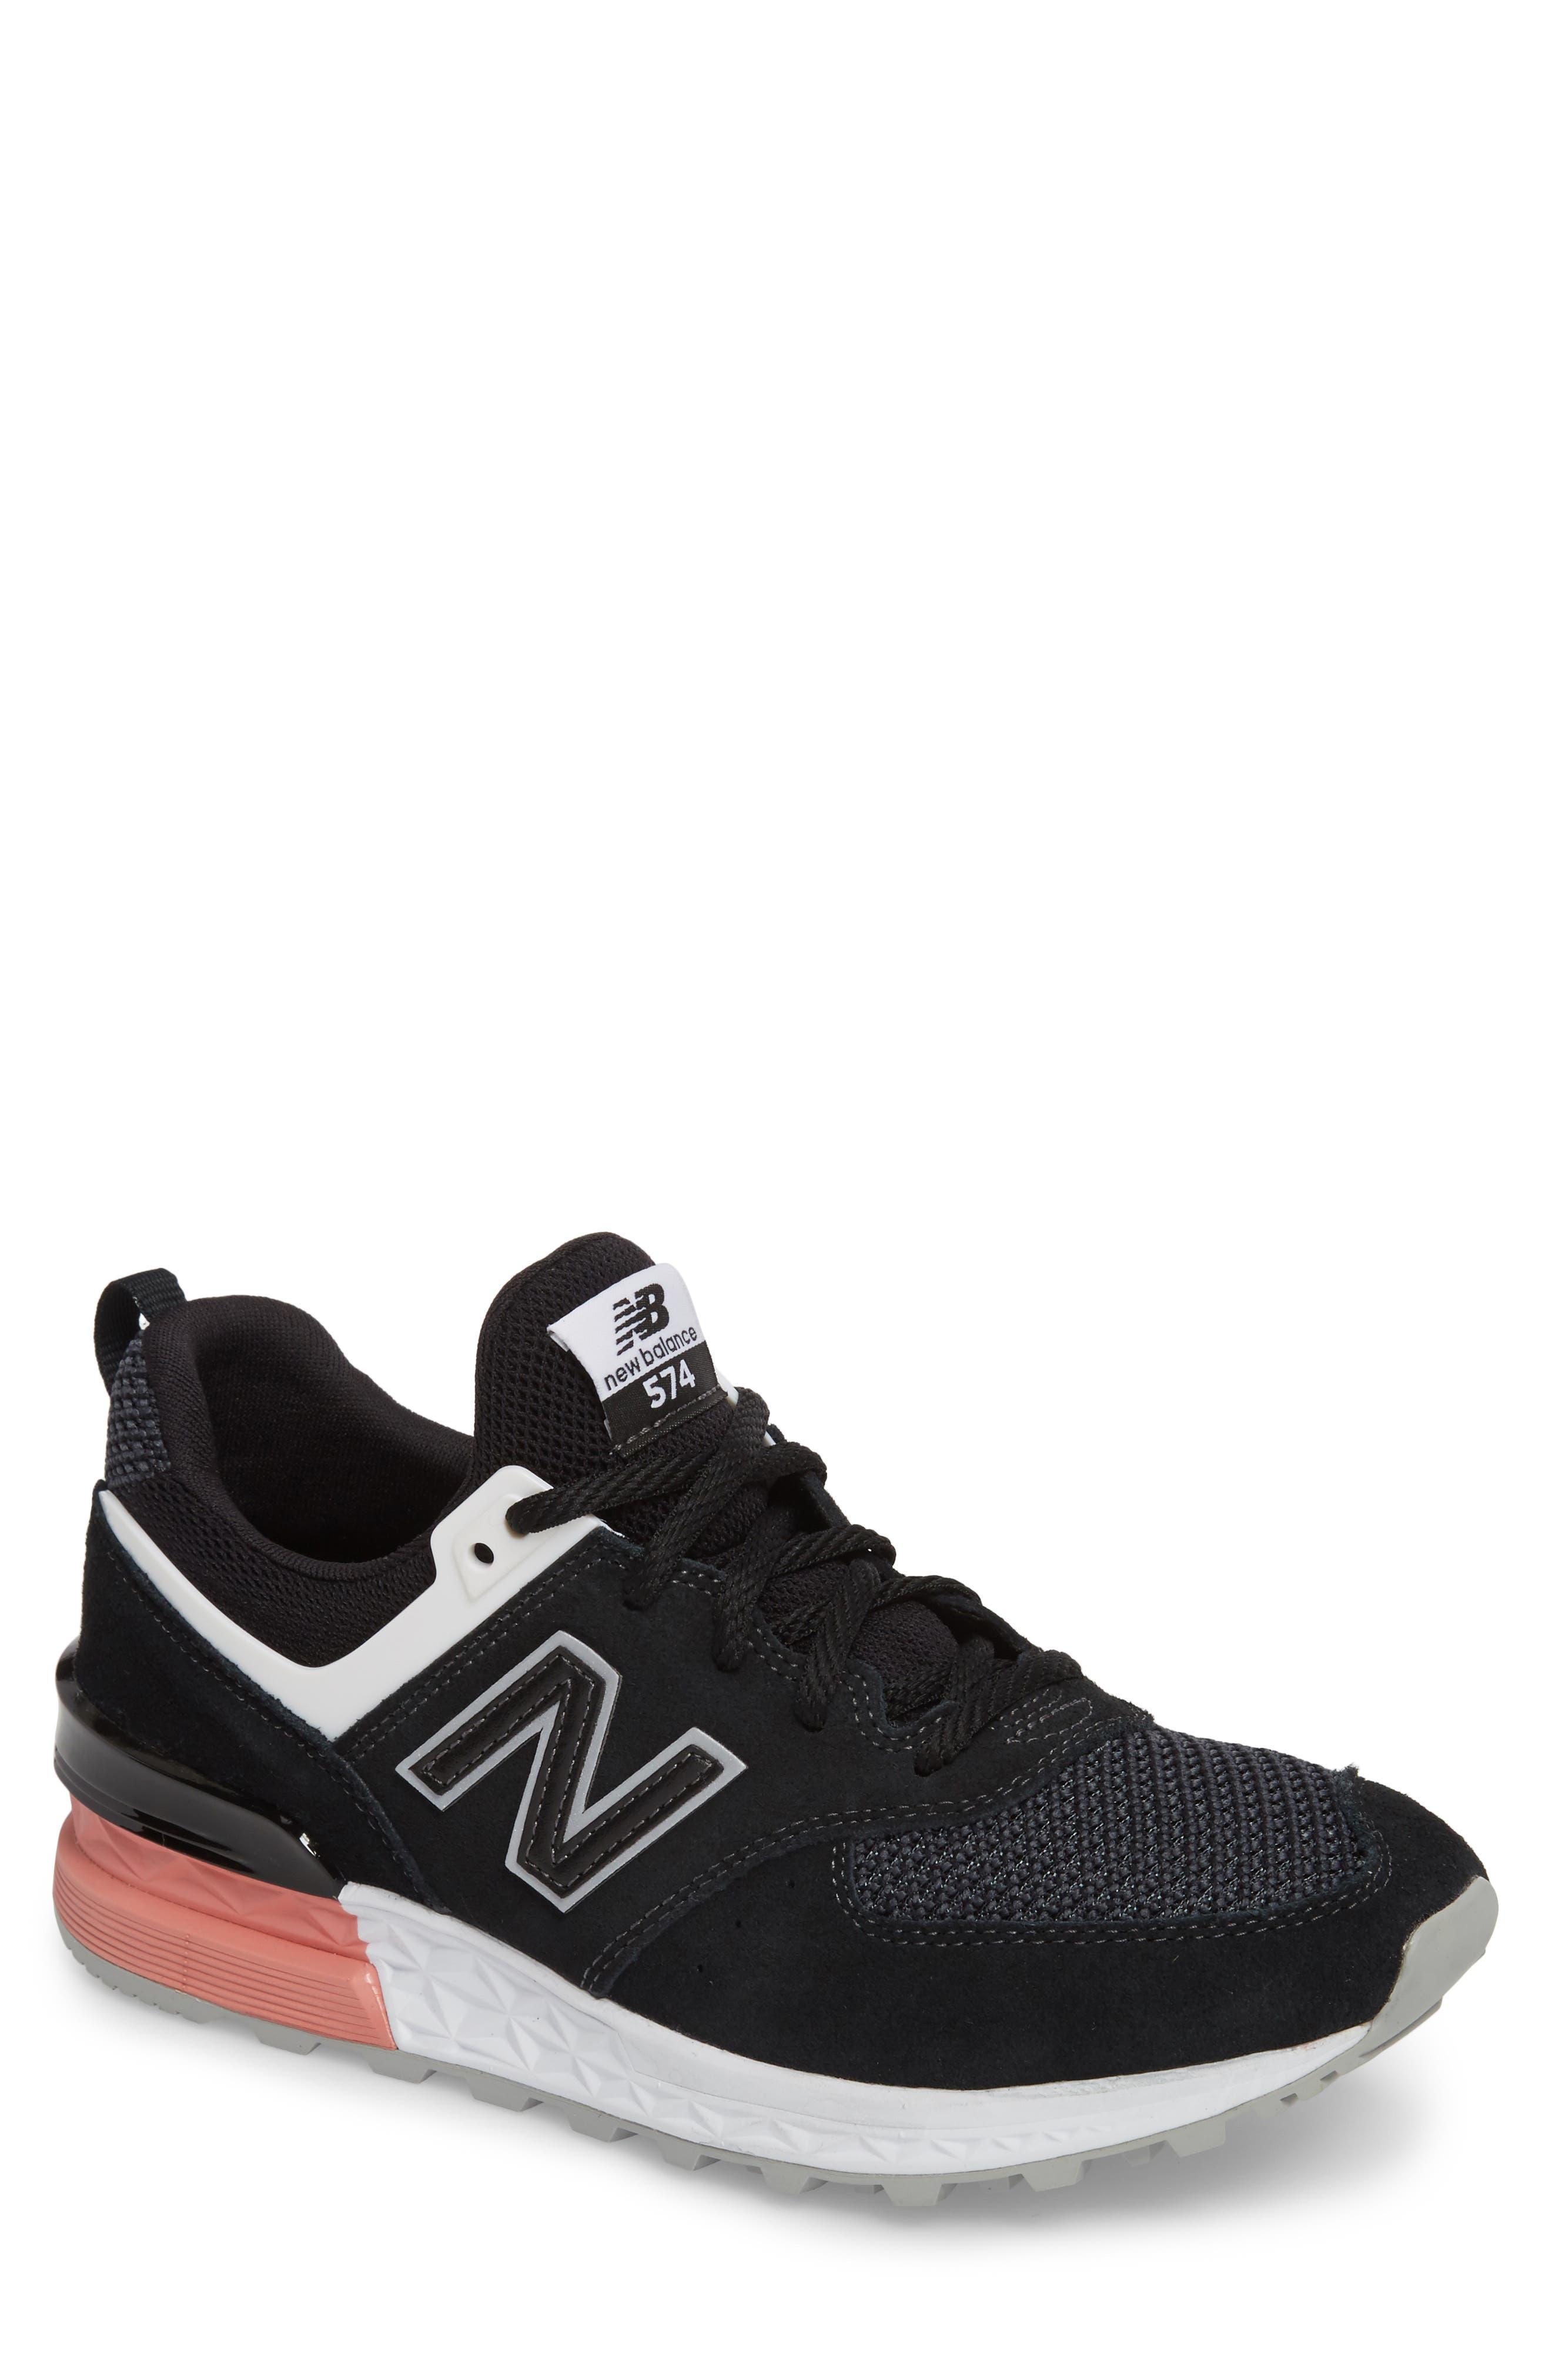 574 T3 Sport Sneaker,                             Main thumbnail 1, color,                             Black